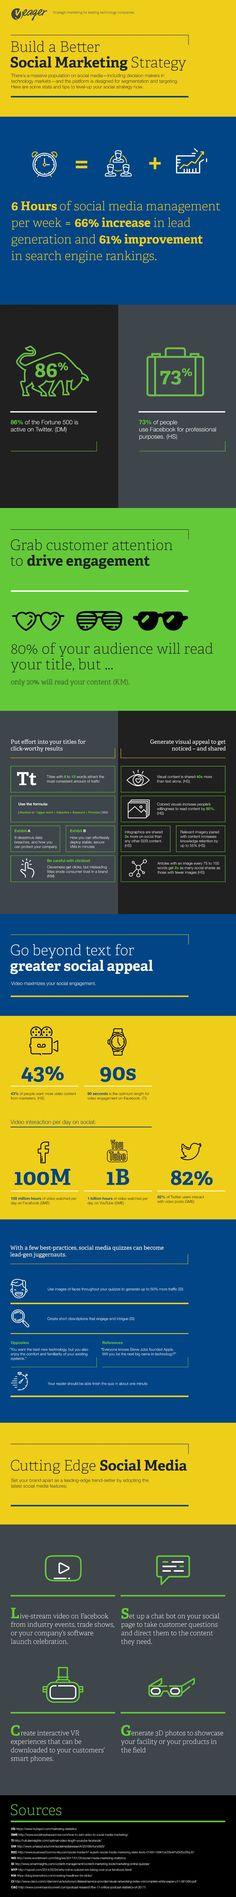 170607-infographic-build-a-better-social-marketing-strategy-full.jpg (890×7157)